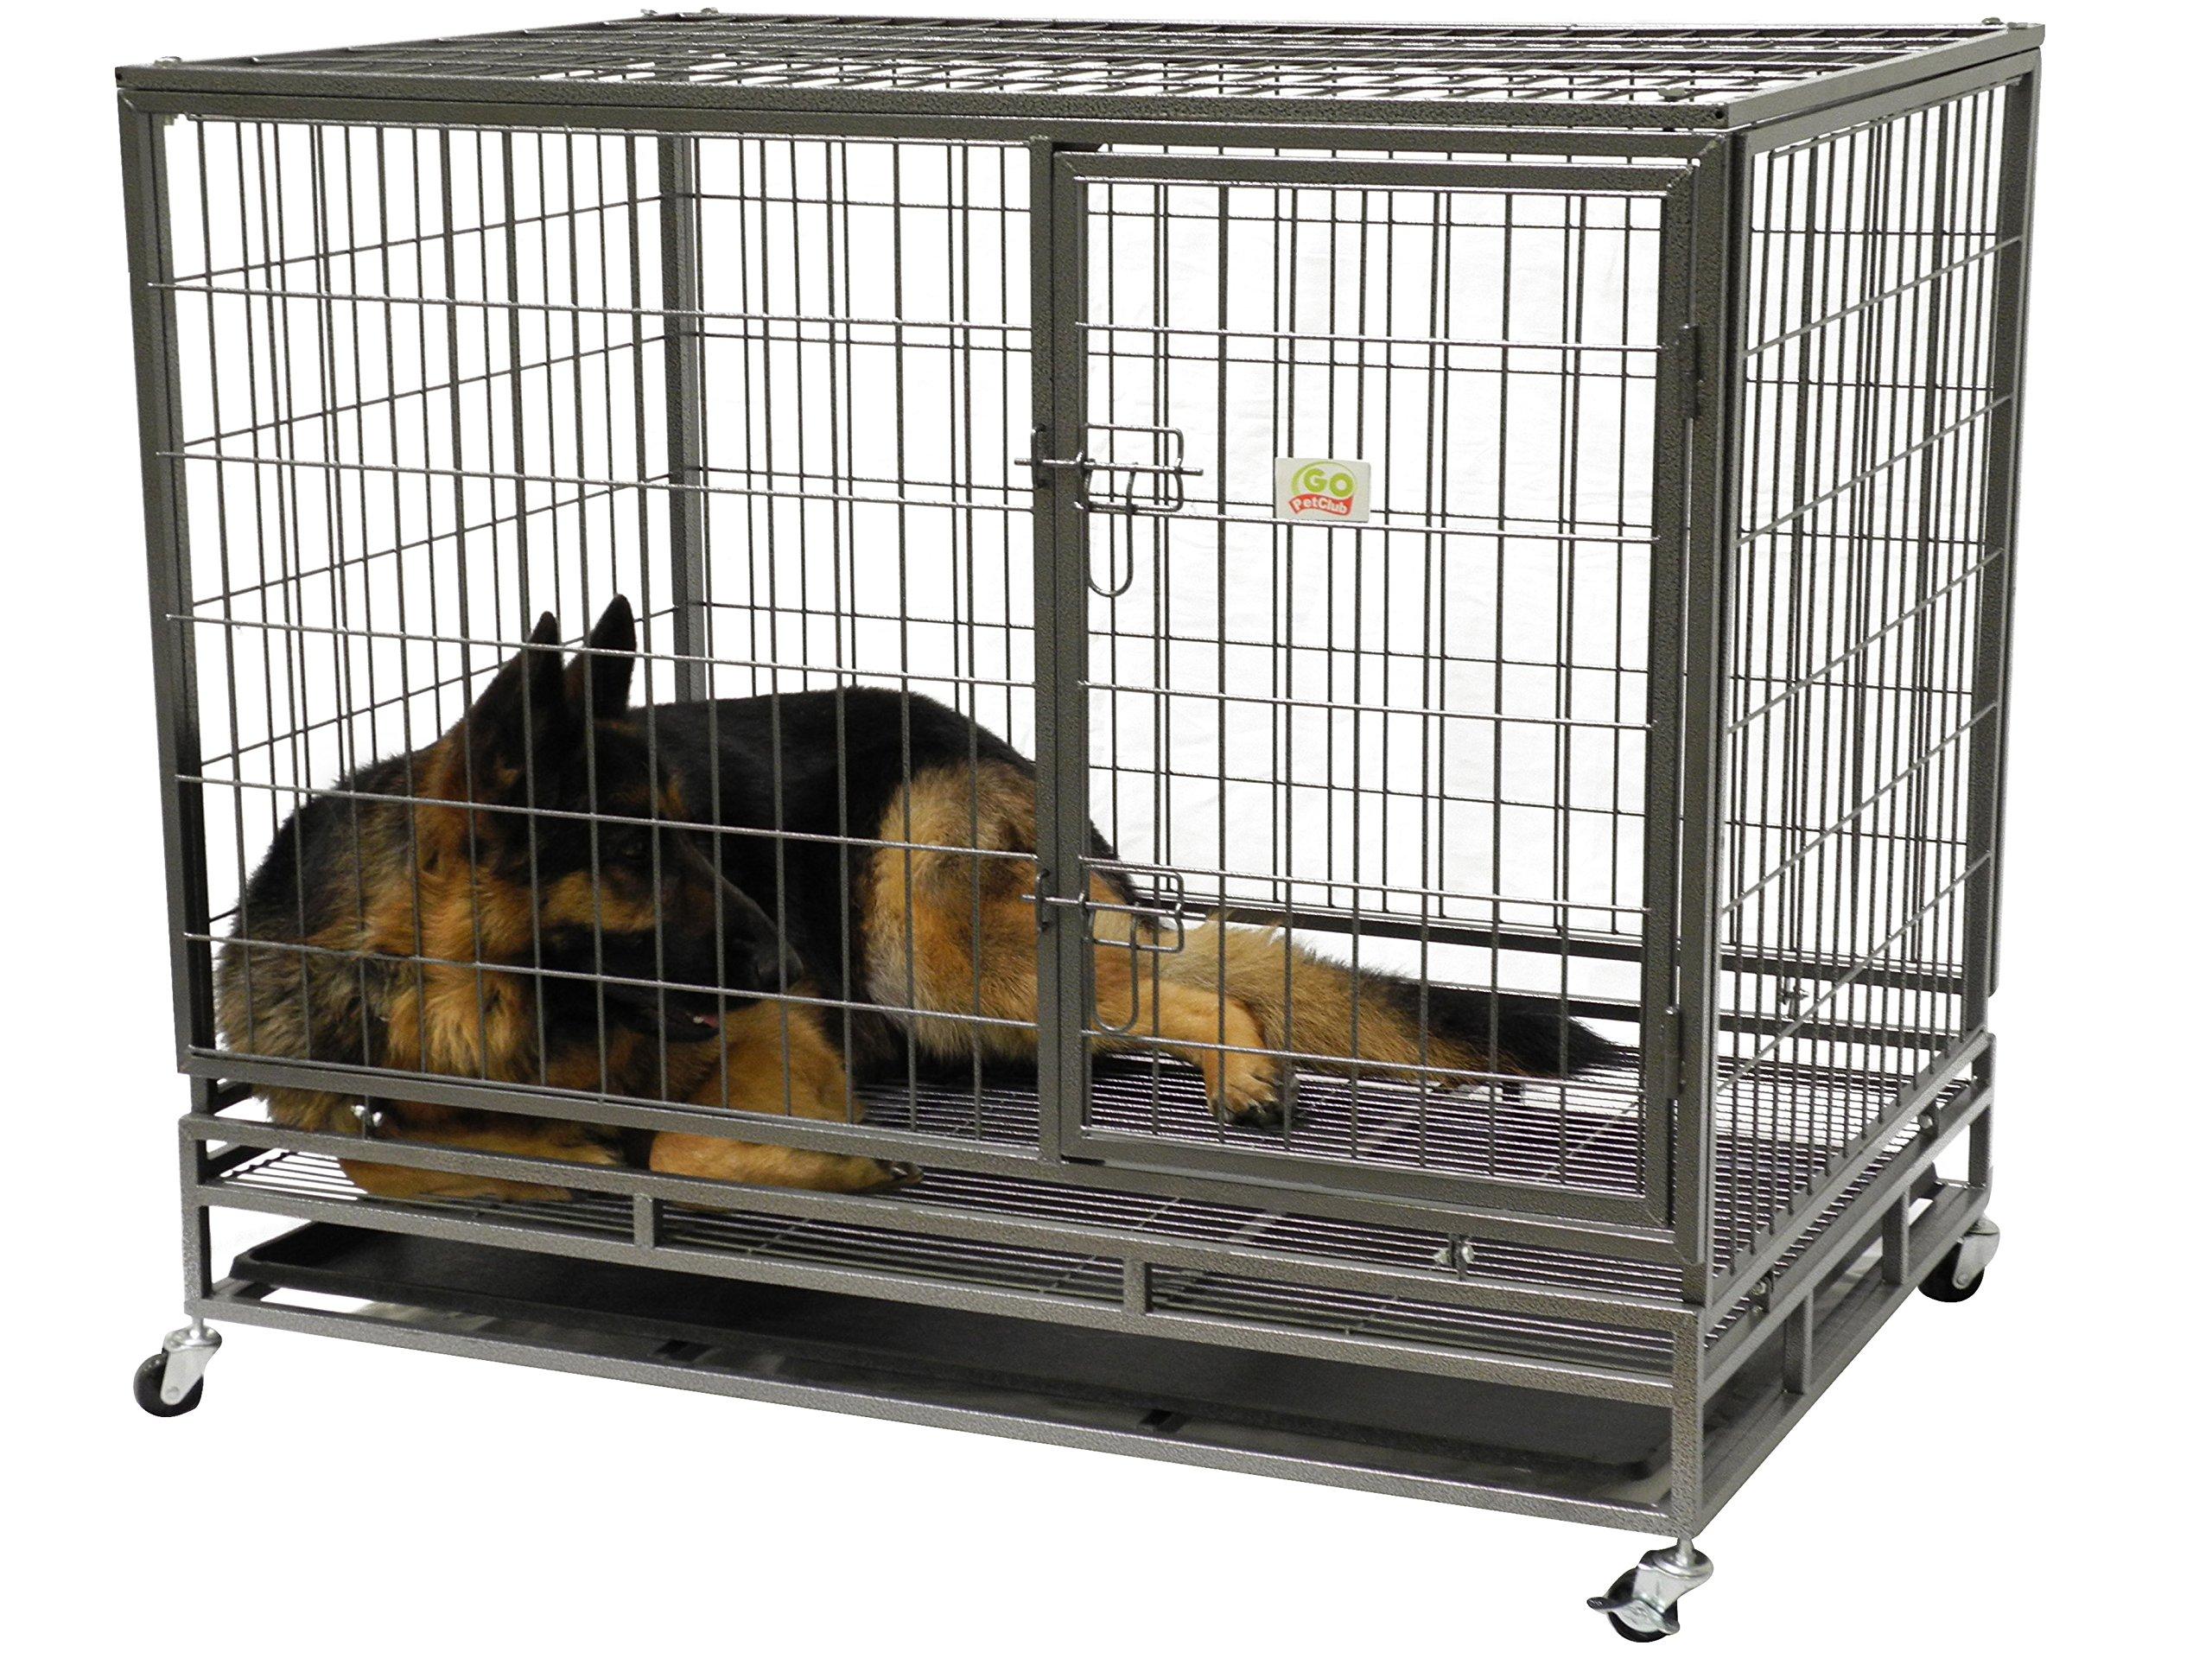 Go Pet Club Heavy Duty Metal Cage, 43-Inch by 30 by 38-Inch